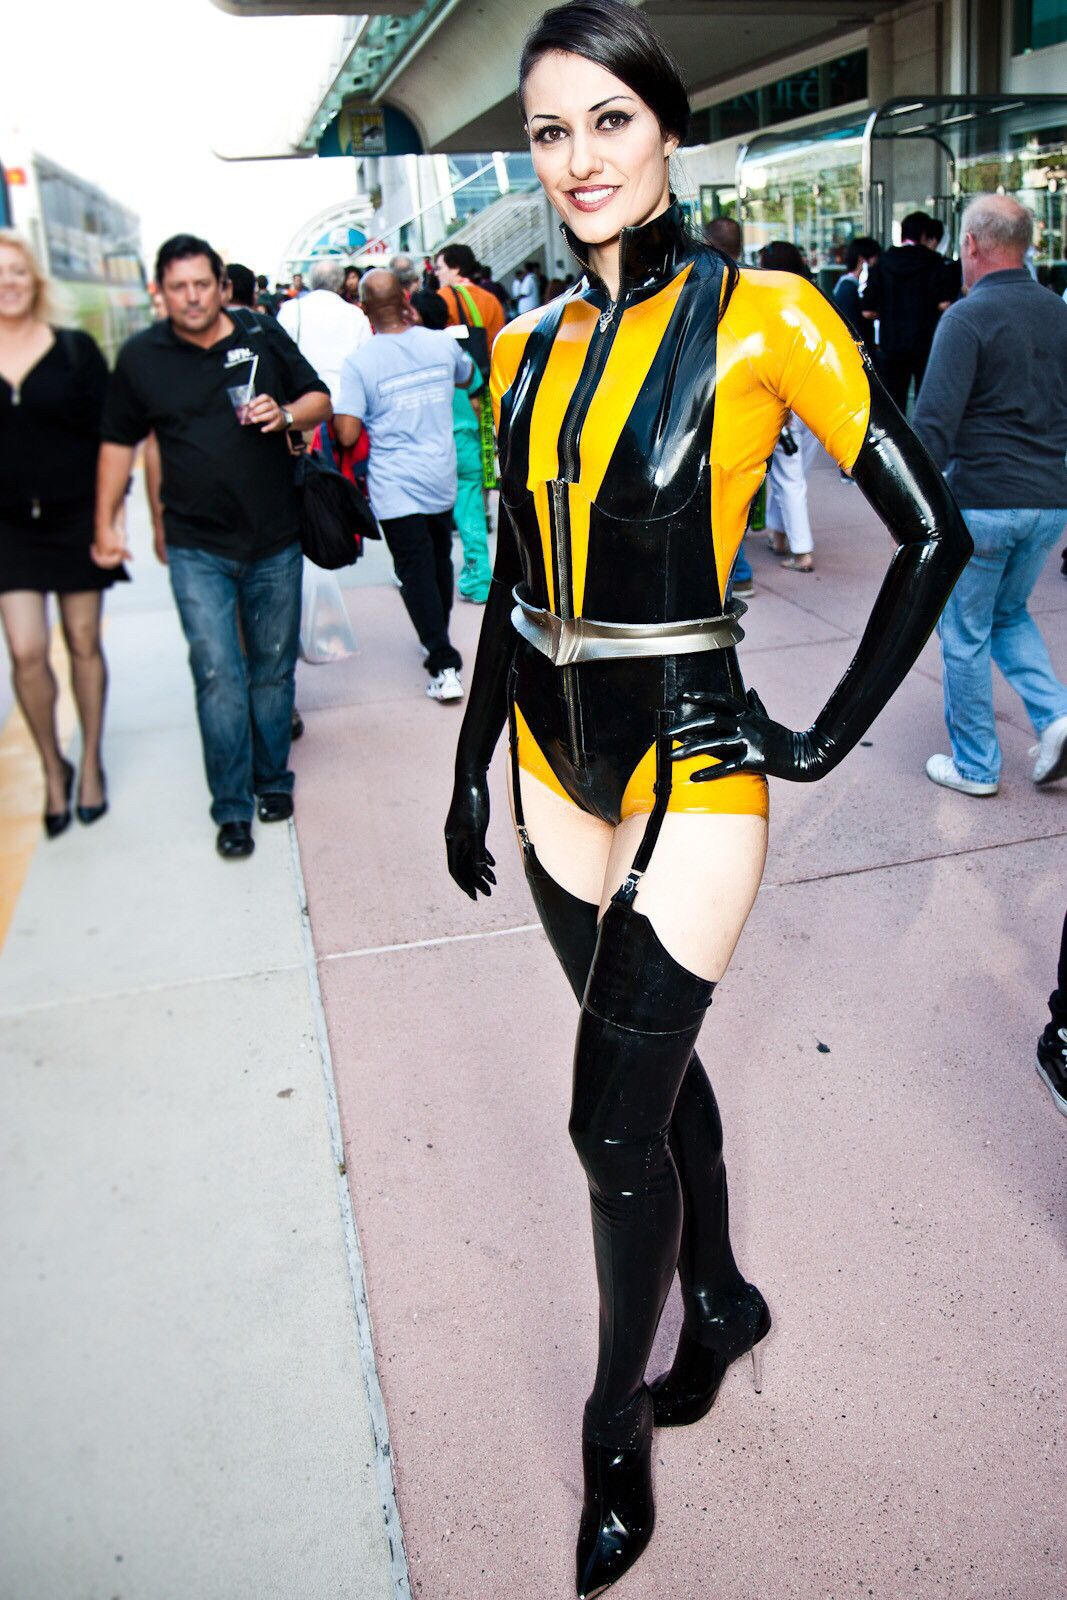 Silk Spectre II (Watchmen) by Annisse   Silk Spectre II ... Watchmen Characters Silk Spectre